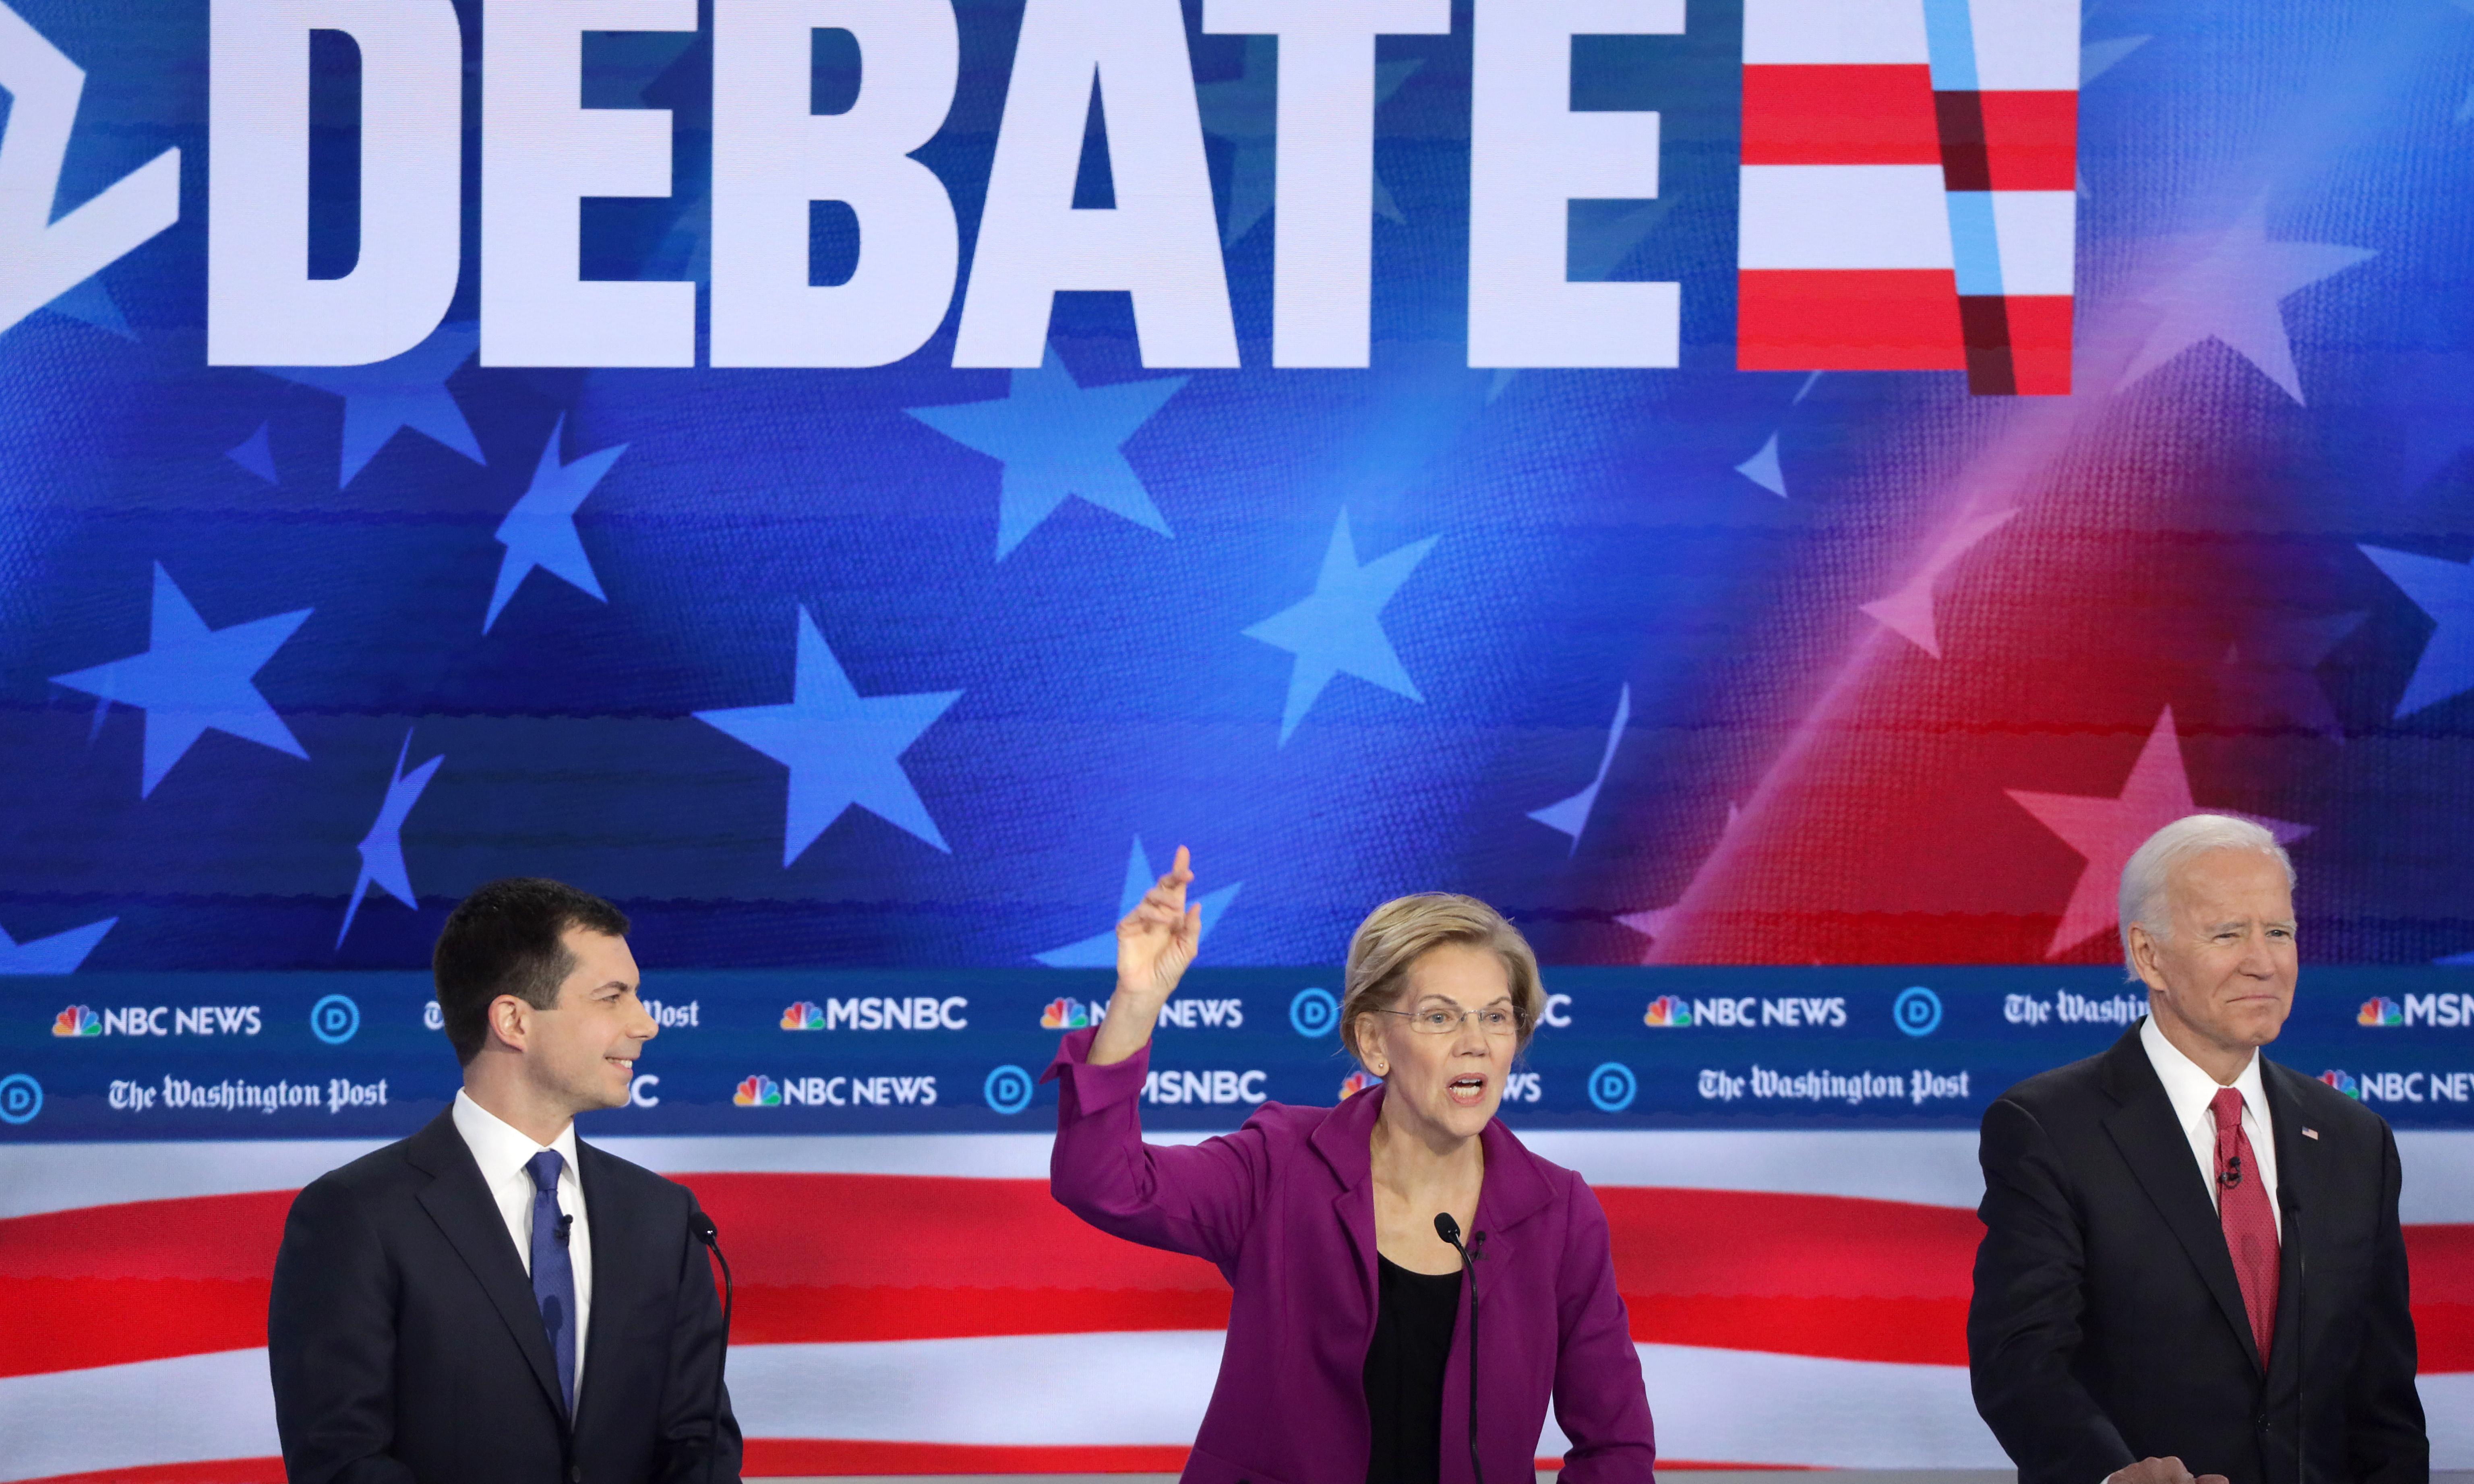 Democratic 2020 hopefuls tear into 'criminal' Trump at debate